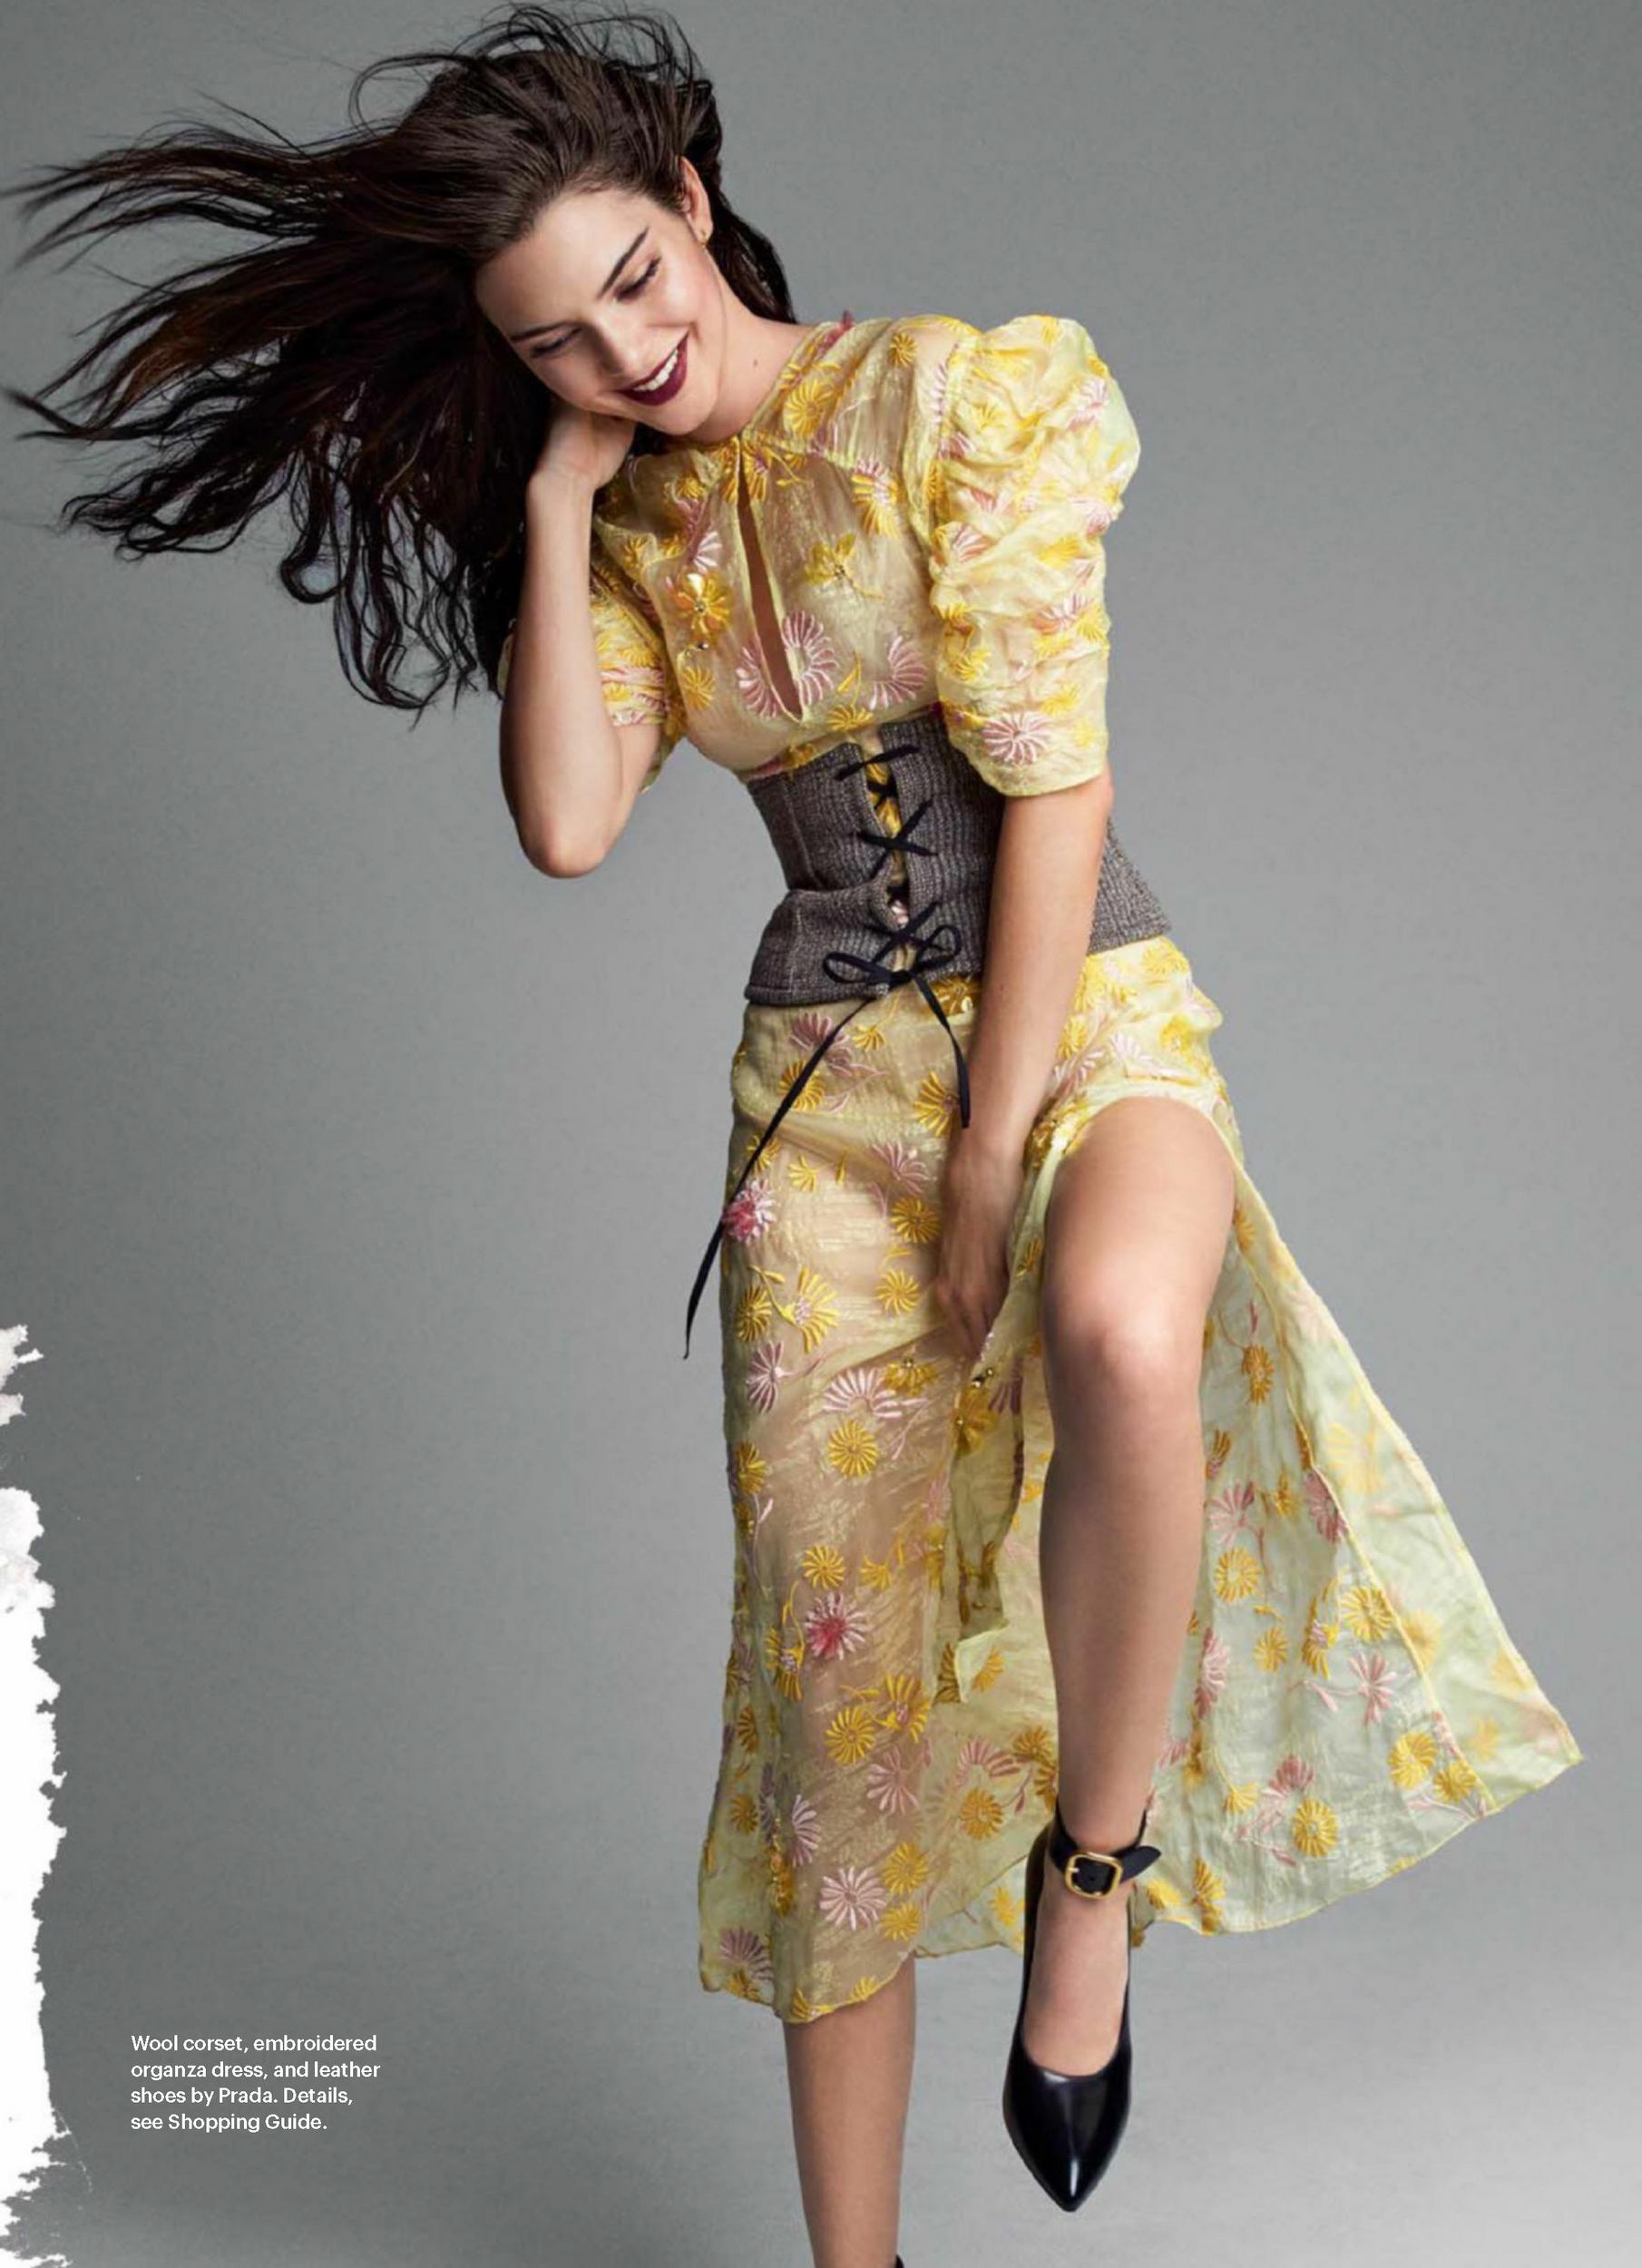 Kendall Jenner Allure Us 2016 16 Gotceleb